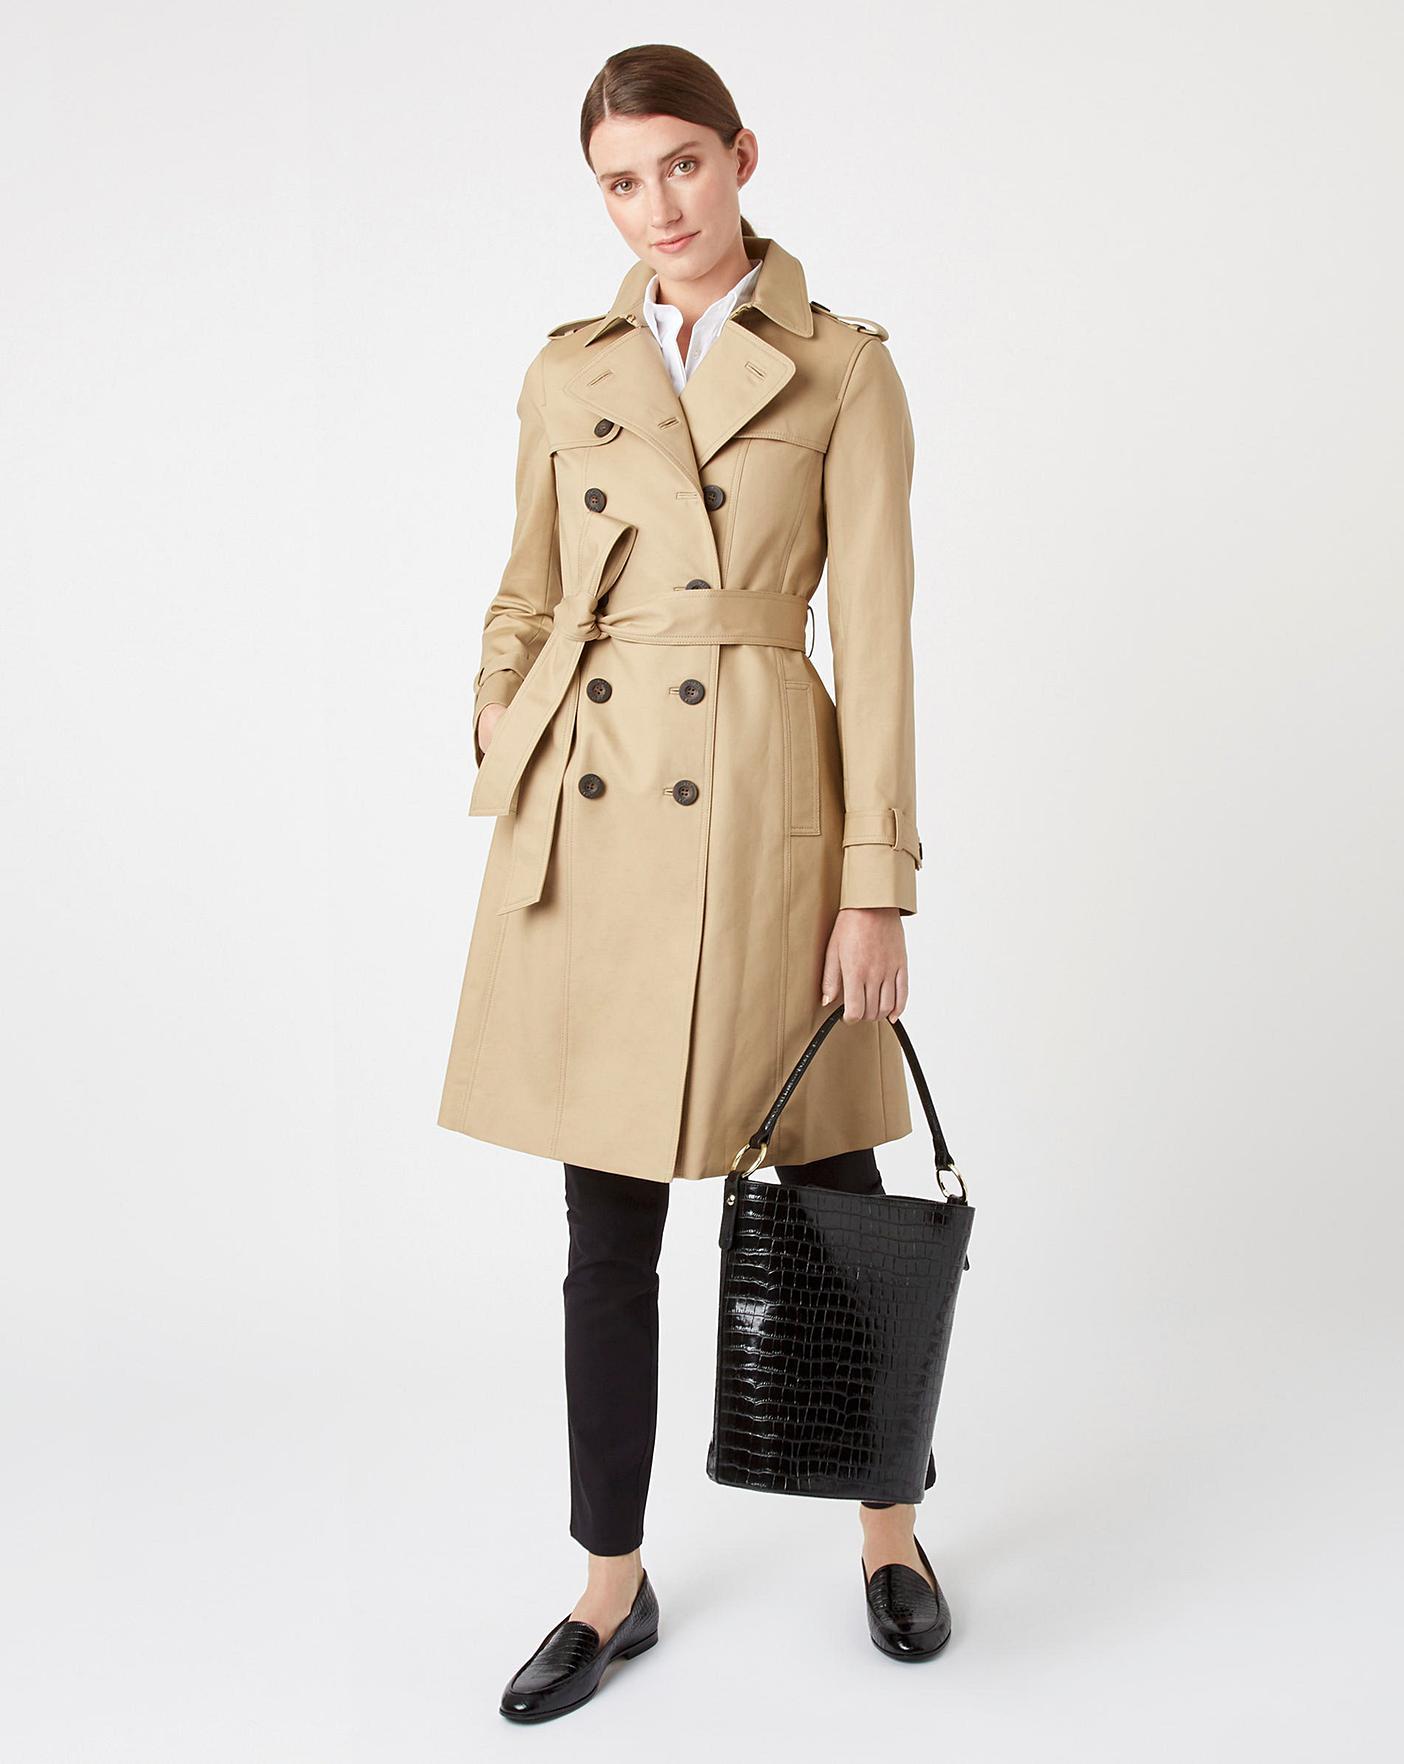 Beige 'Saskia' Trench Coat